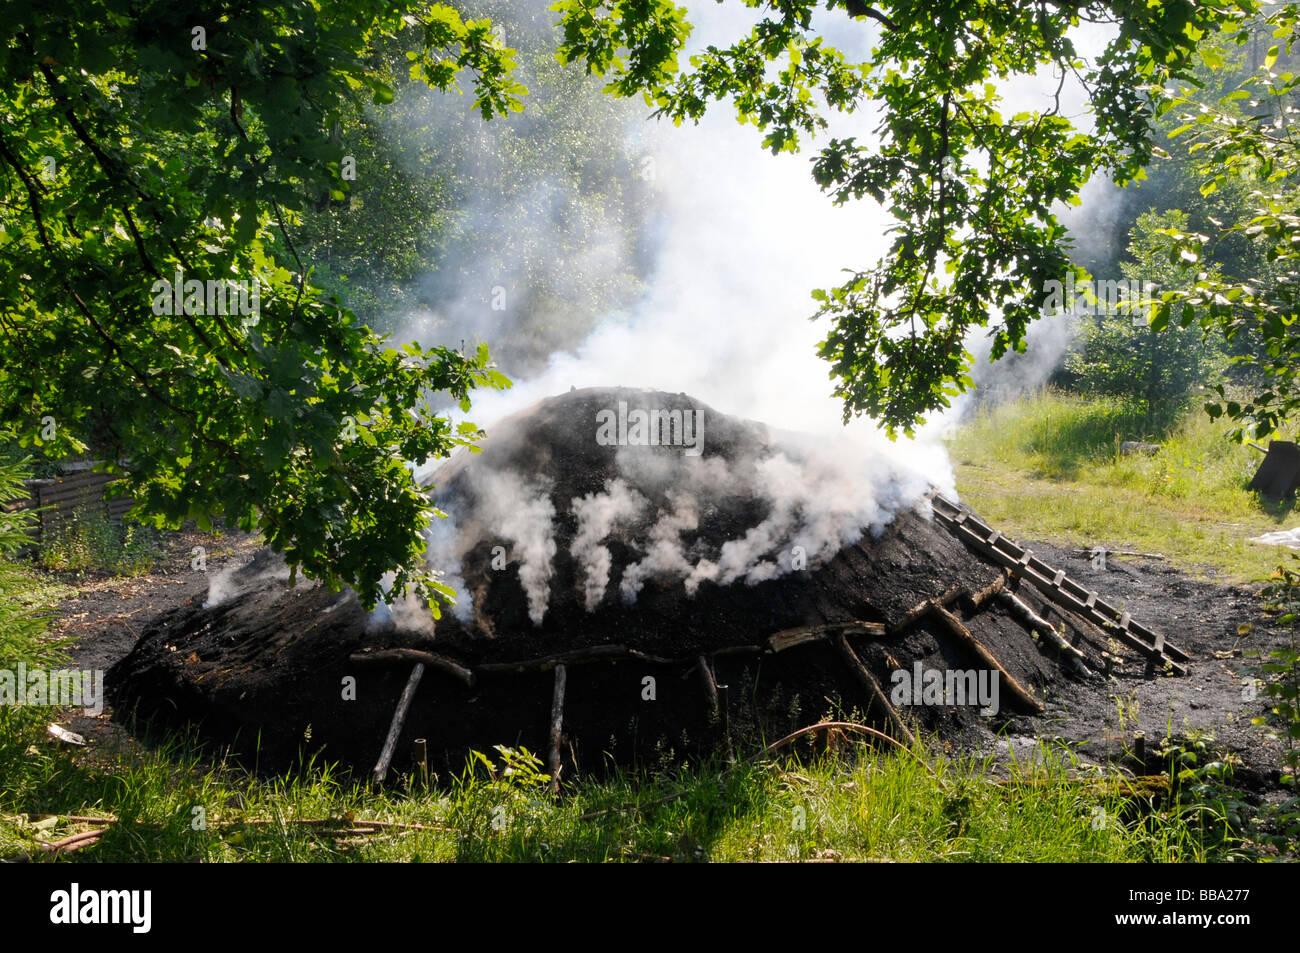 Glimmering charcole pile in Siegerland near Netphen, North Rhine-Westphalia, Germany - Stock Image